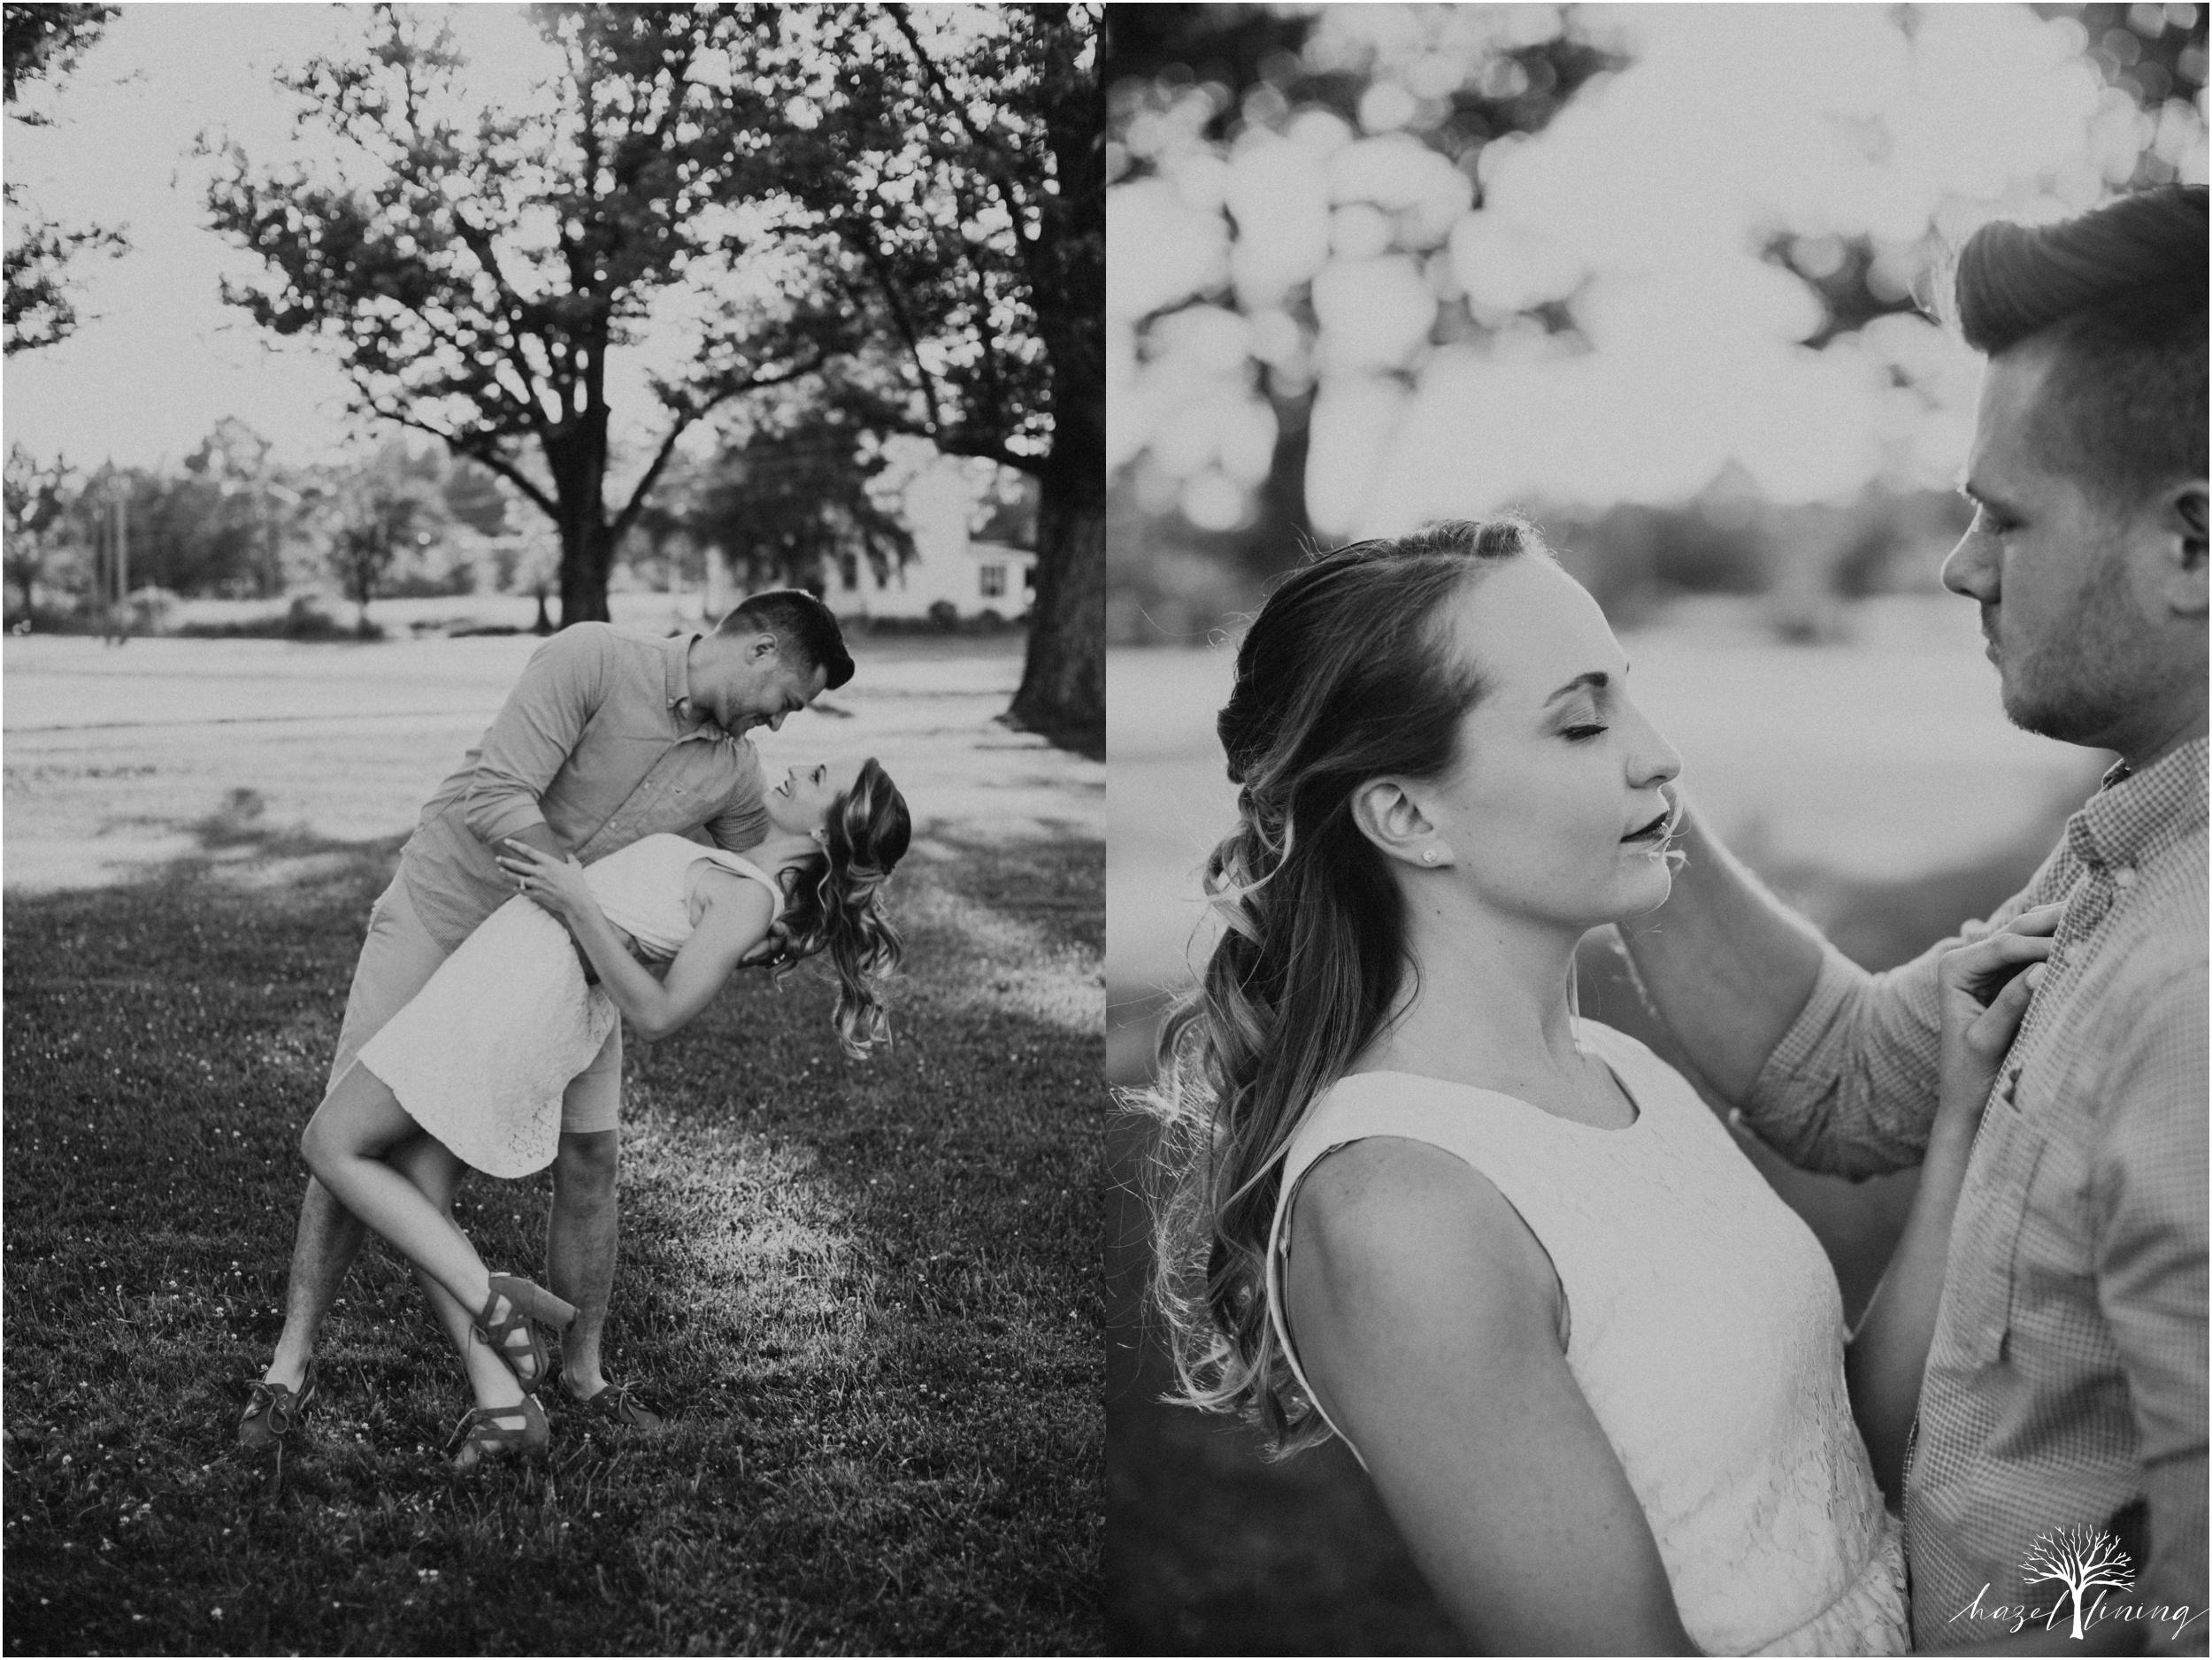 rachel-warner-chris-niedrist-the-farm-bakery-and-events-quakertown-pa-summer-engagement-hazel-lining-photography-destination-elopement-wedding-engagement-photography_0011.jpg